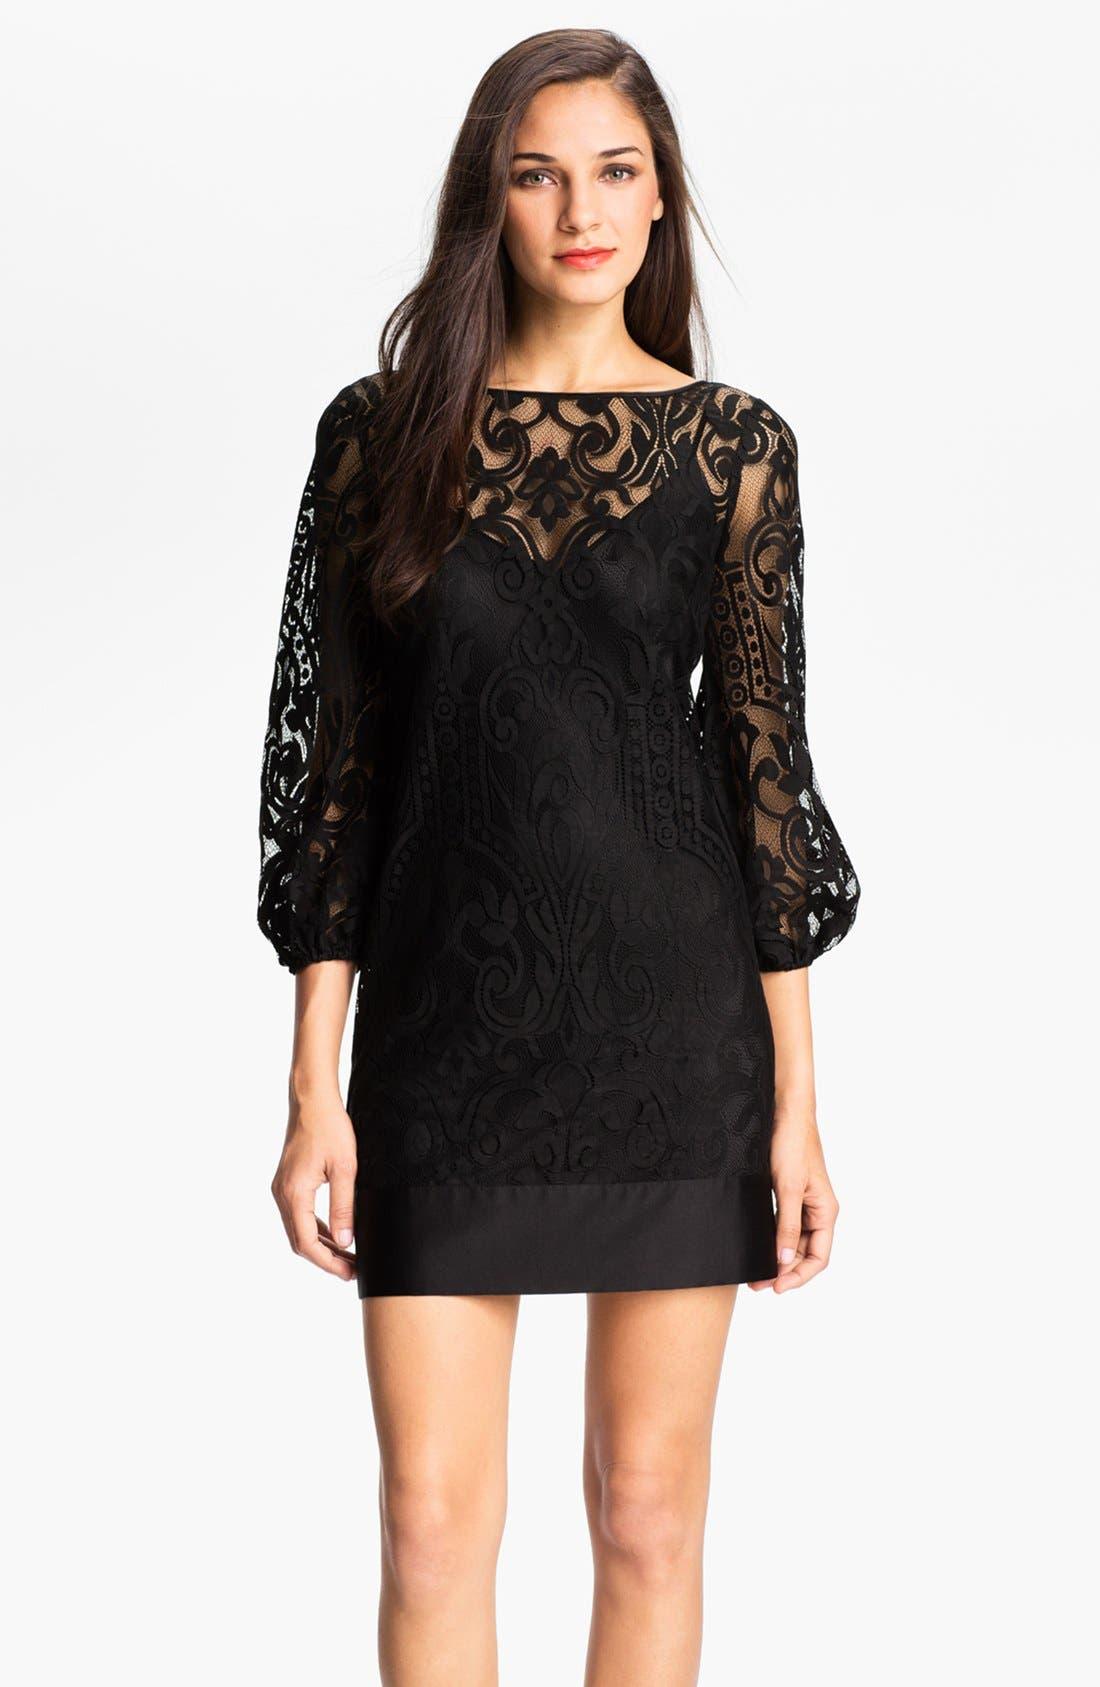 Alternate Image 1 Selected - Laundry by Shelli Segal Blouson Sleeve Lace Dress (Regular & Petite)